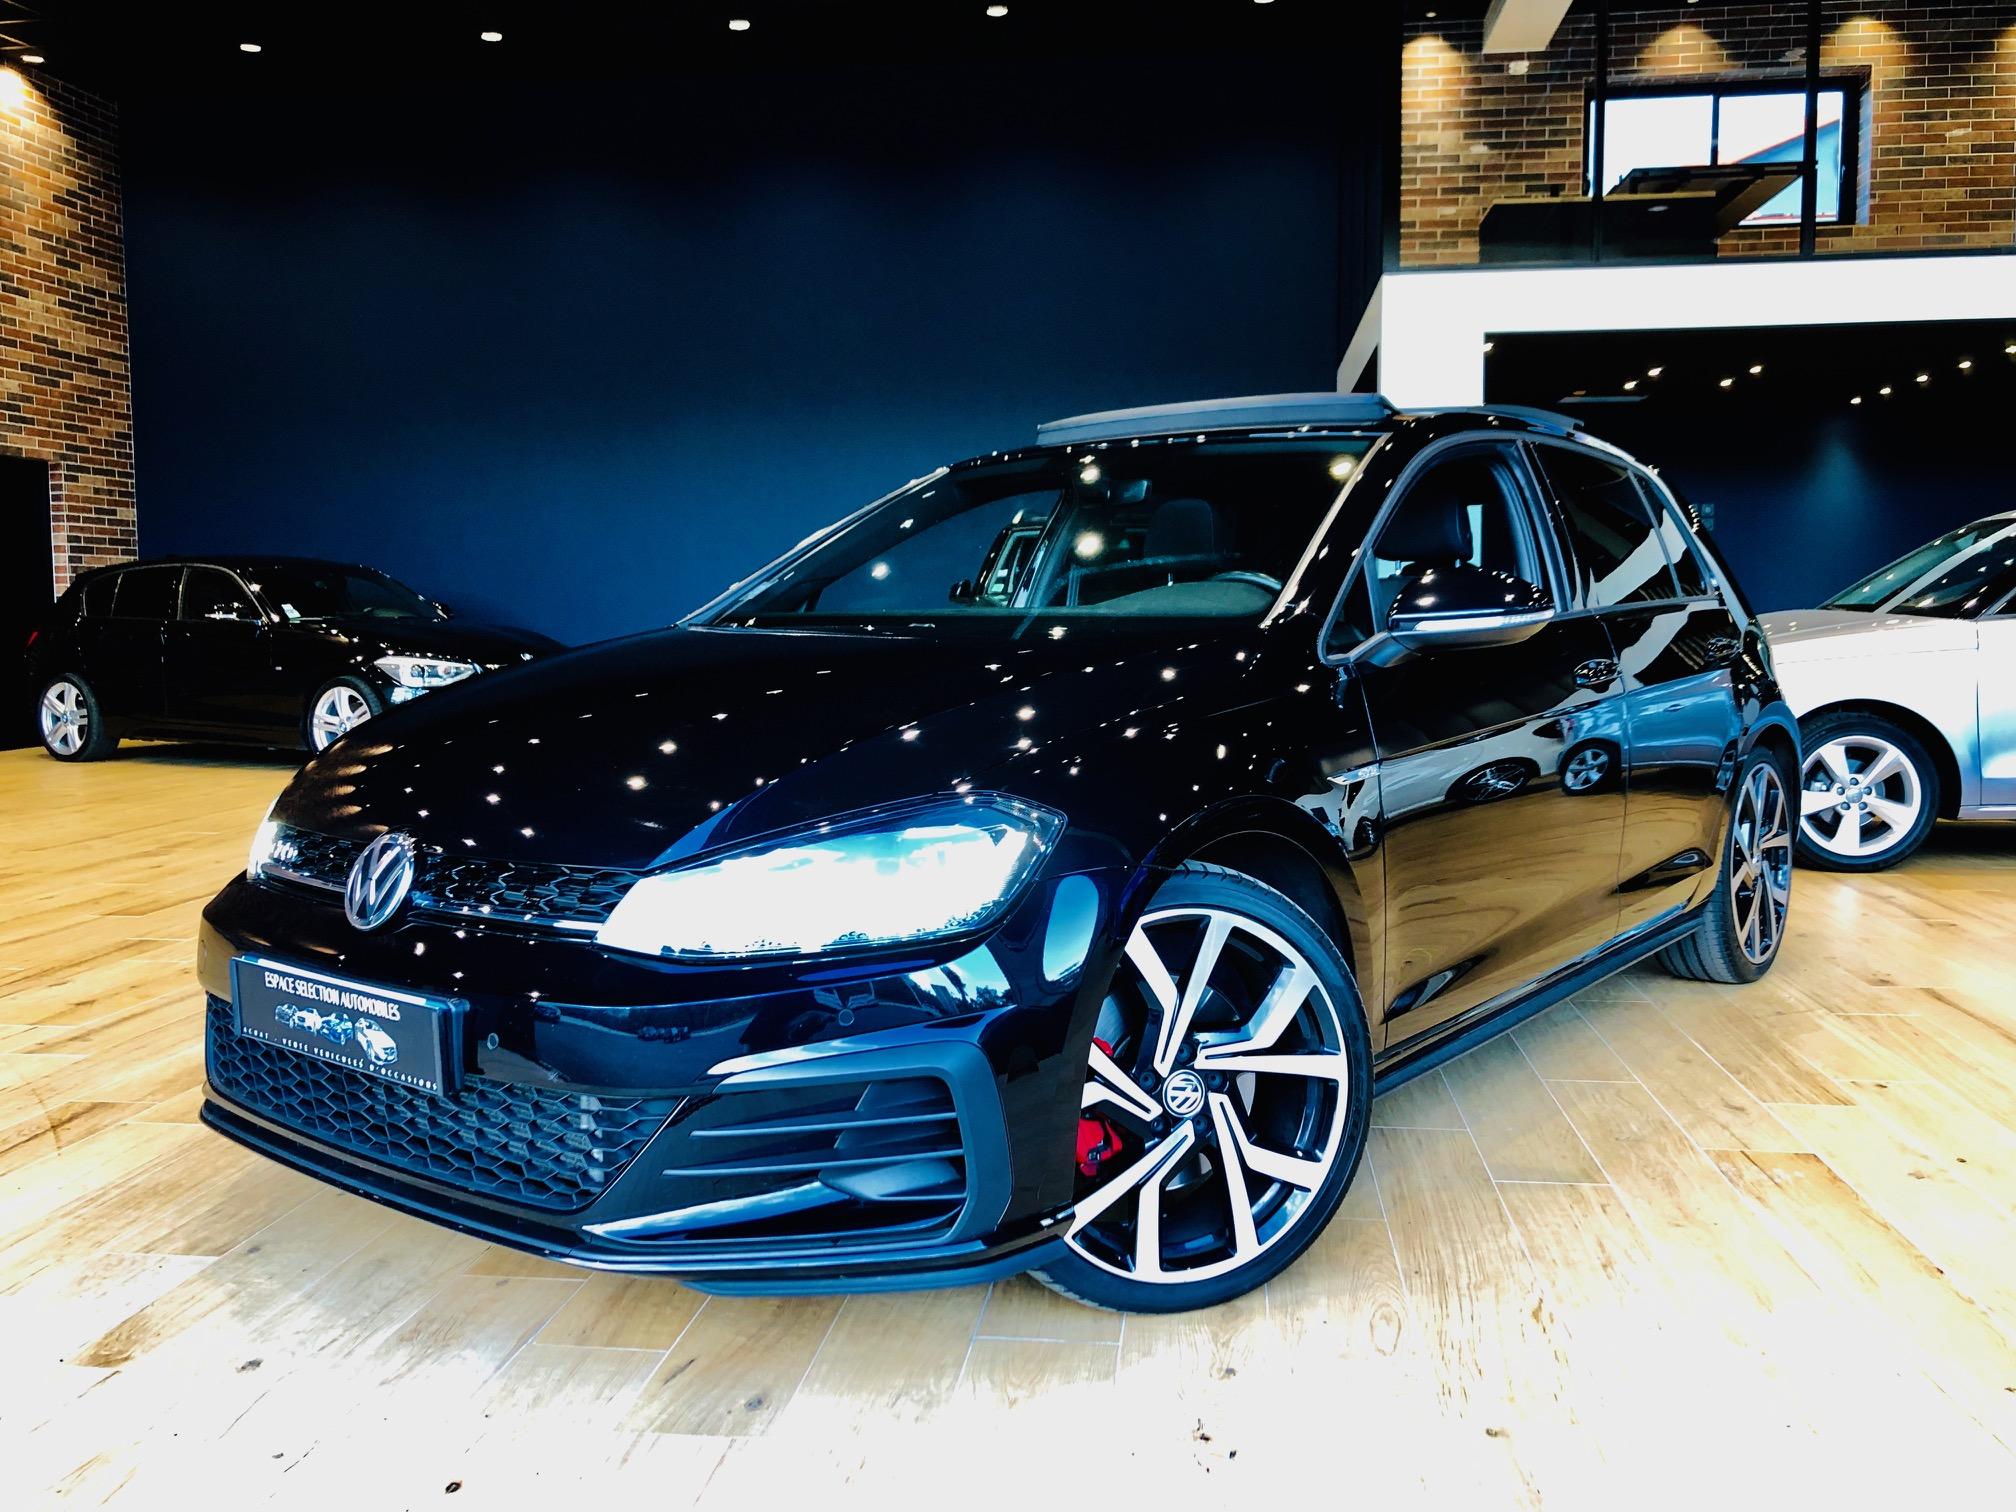 Occasion Volkswagen Golf 7 GTD 2.0 184cv Face Avant Droite